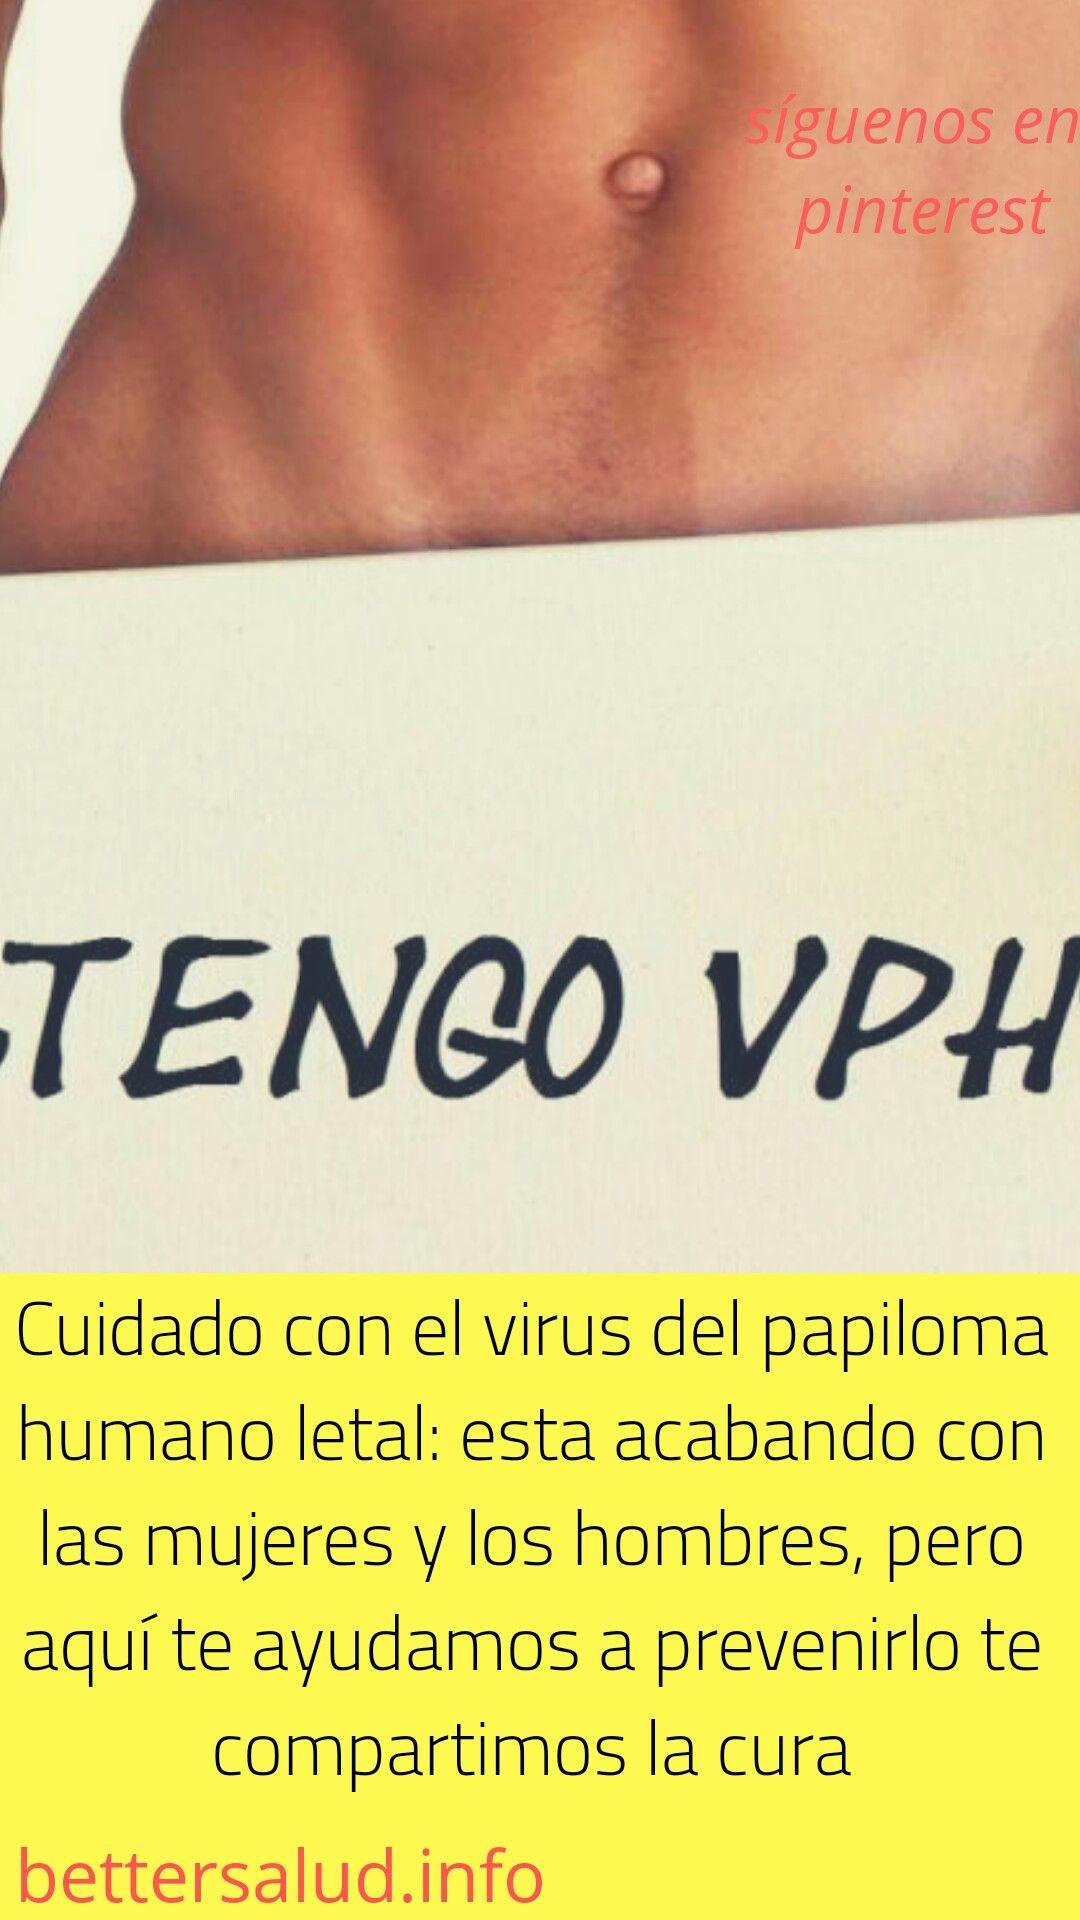 papilloma squamoso vescicale pancreatic cancer pembrolizumab